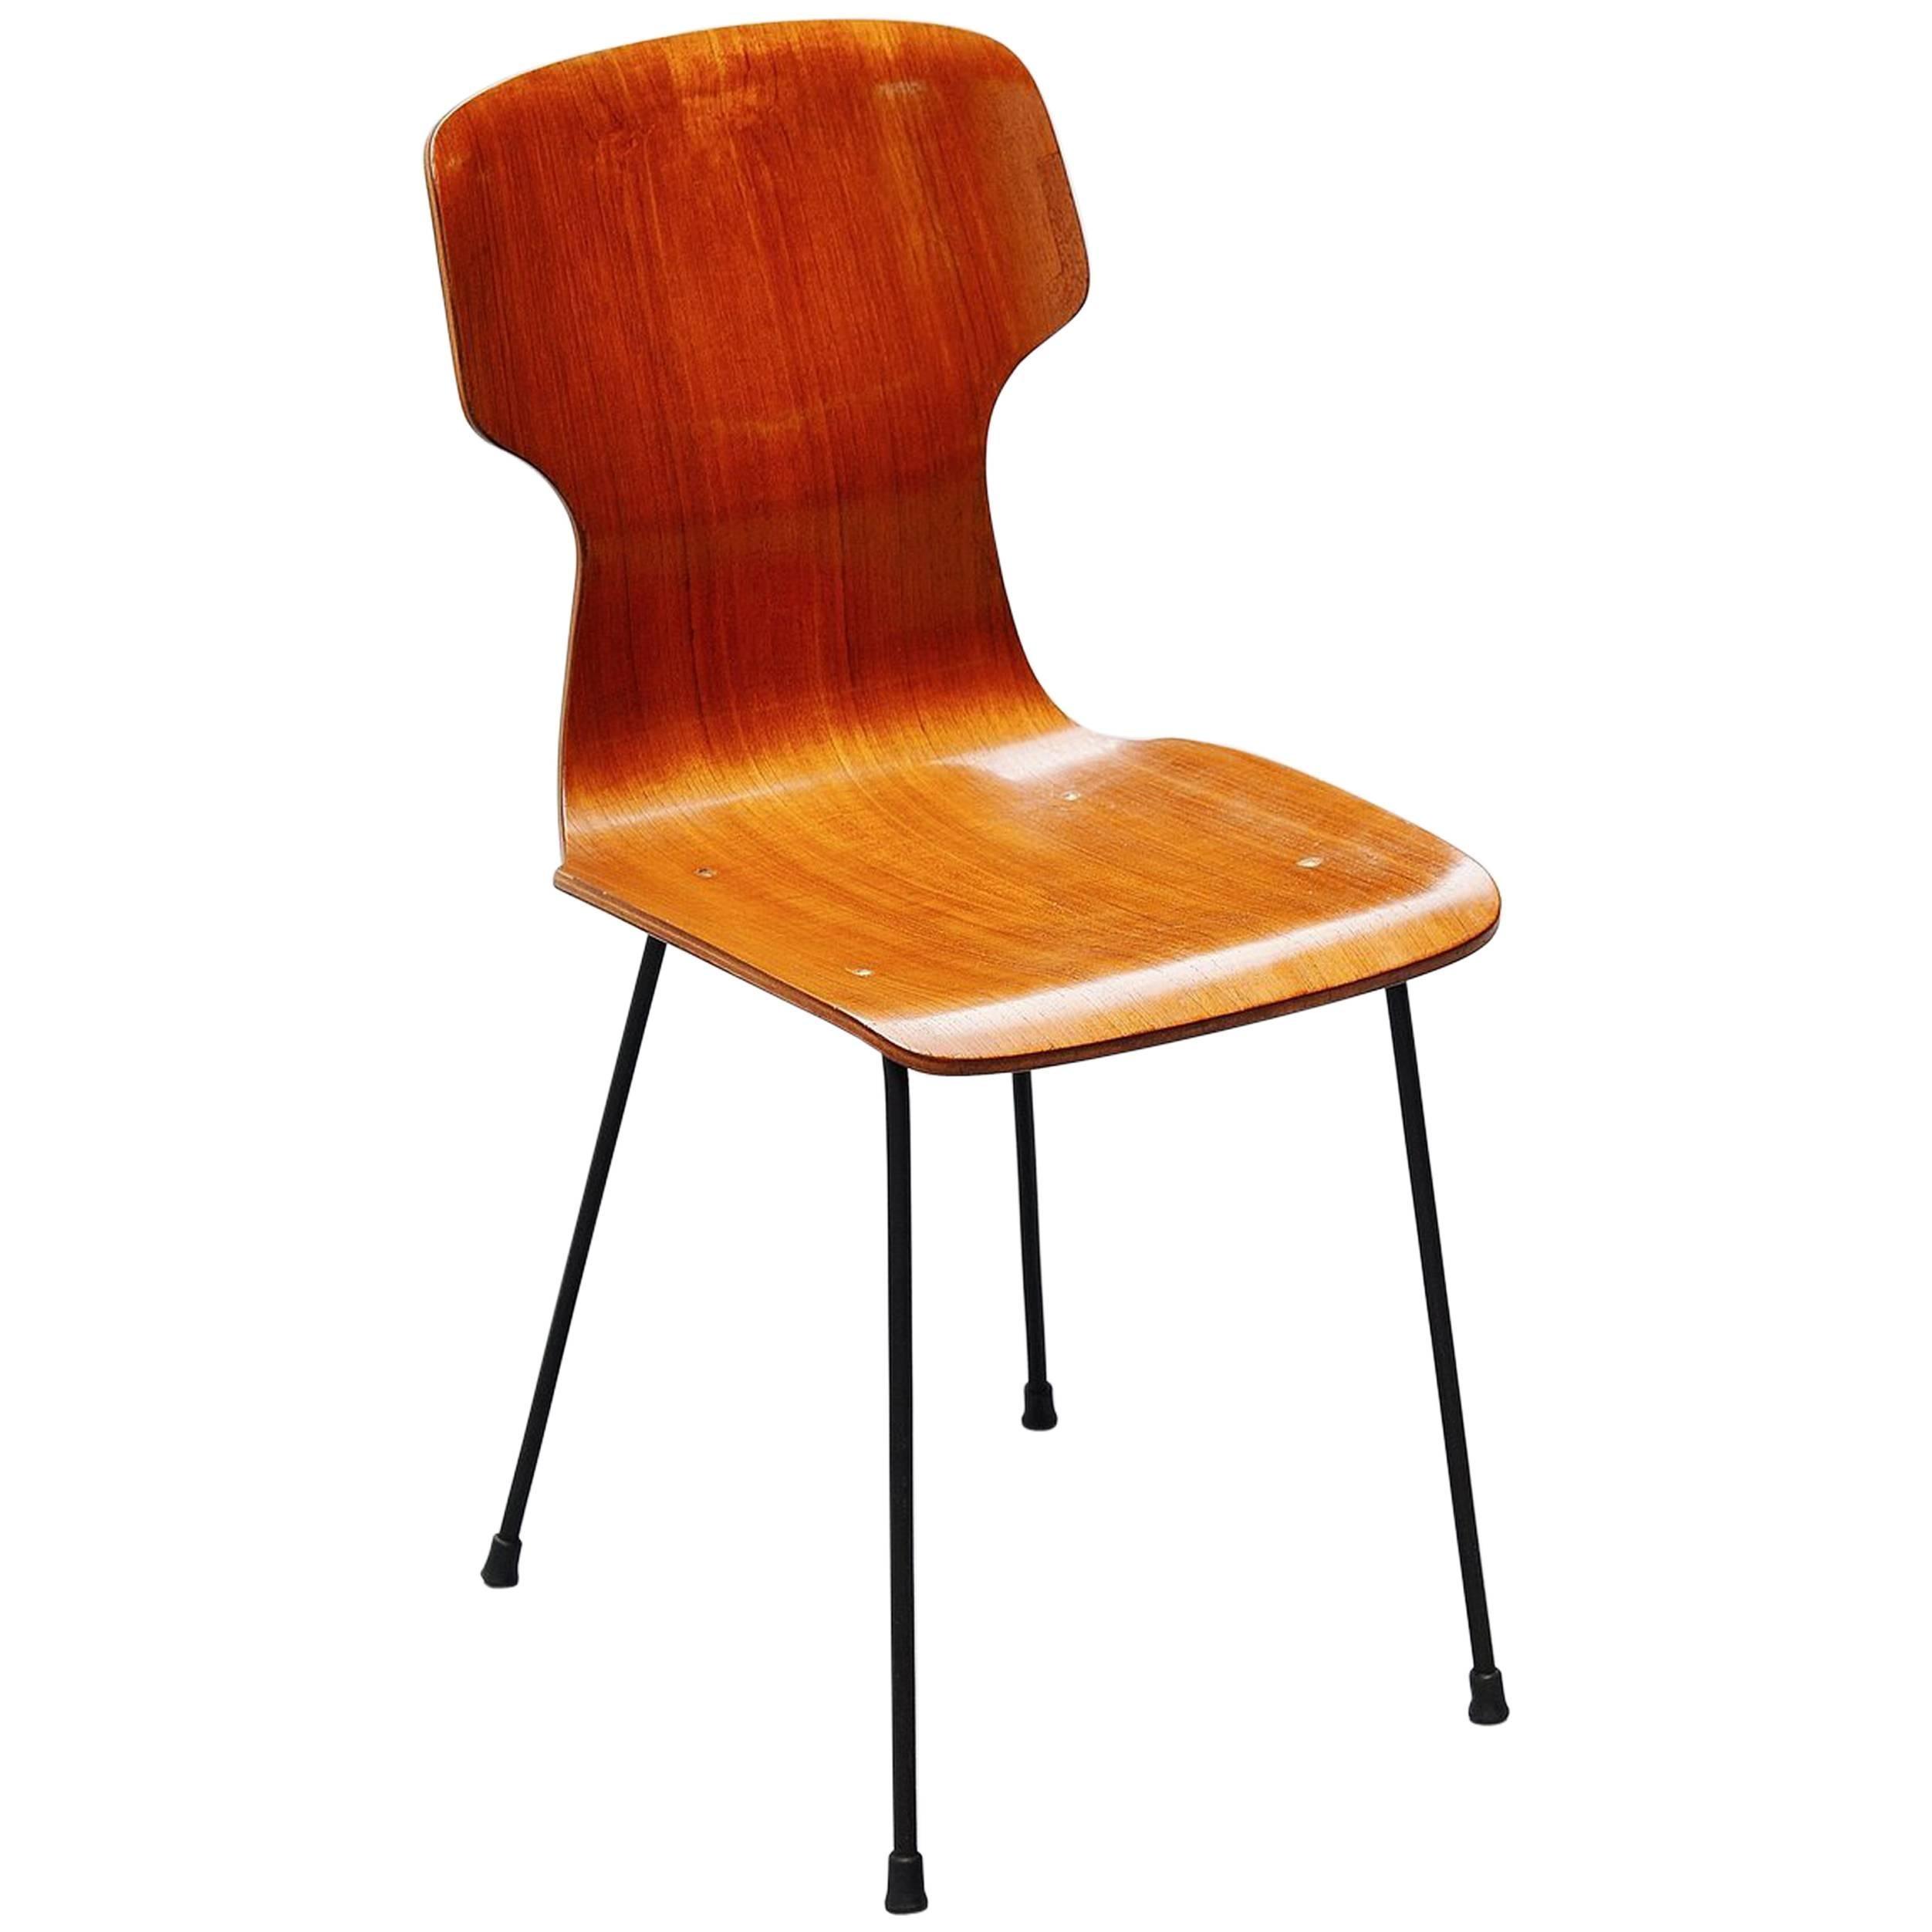 Carlo Ratti Side Chair in Plywood by Legni Curva, Italy, 1950